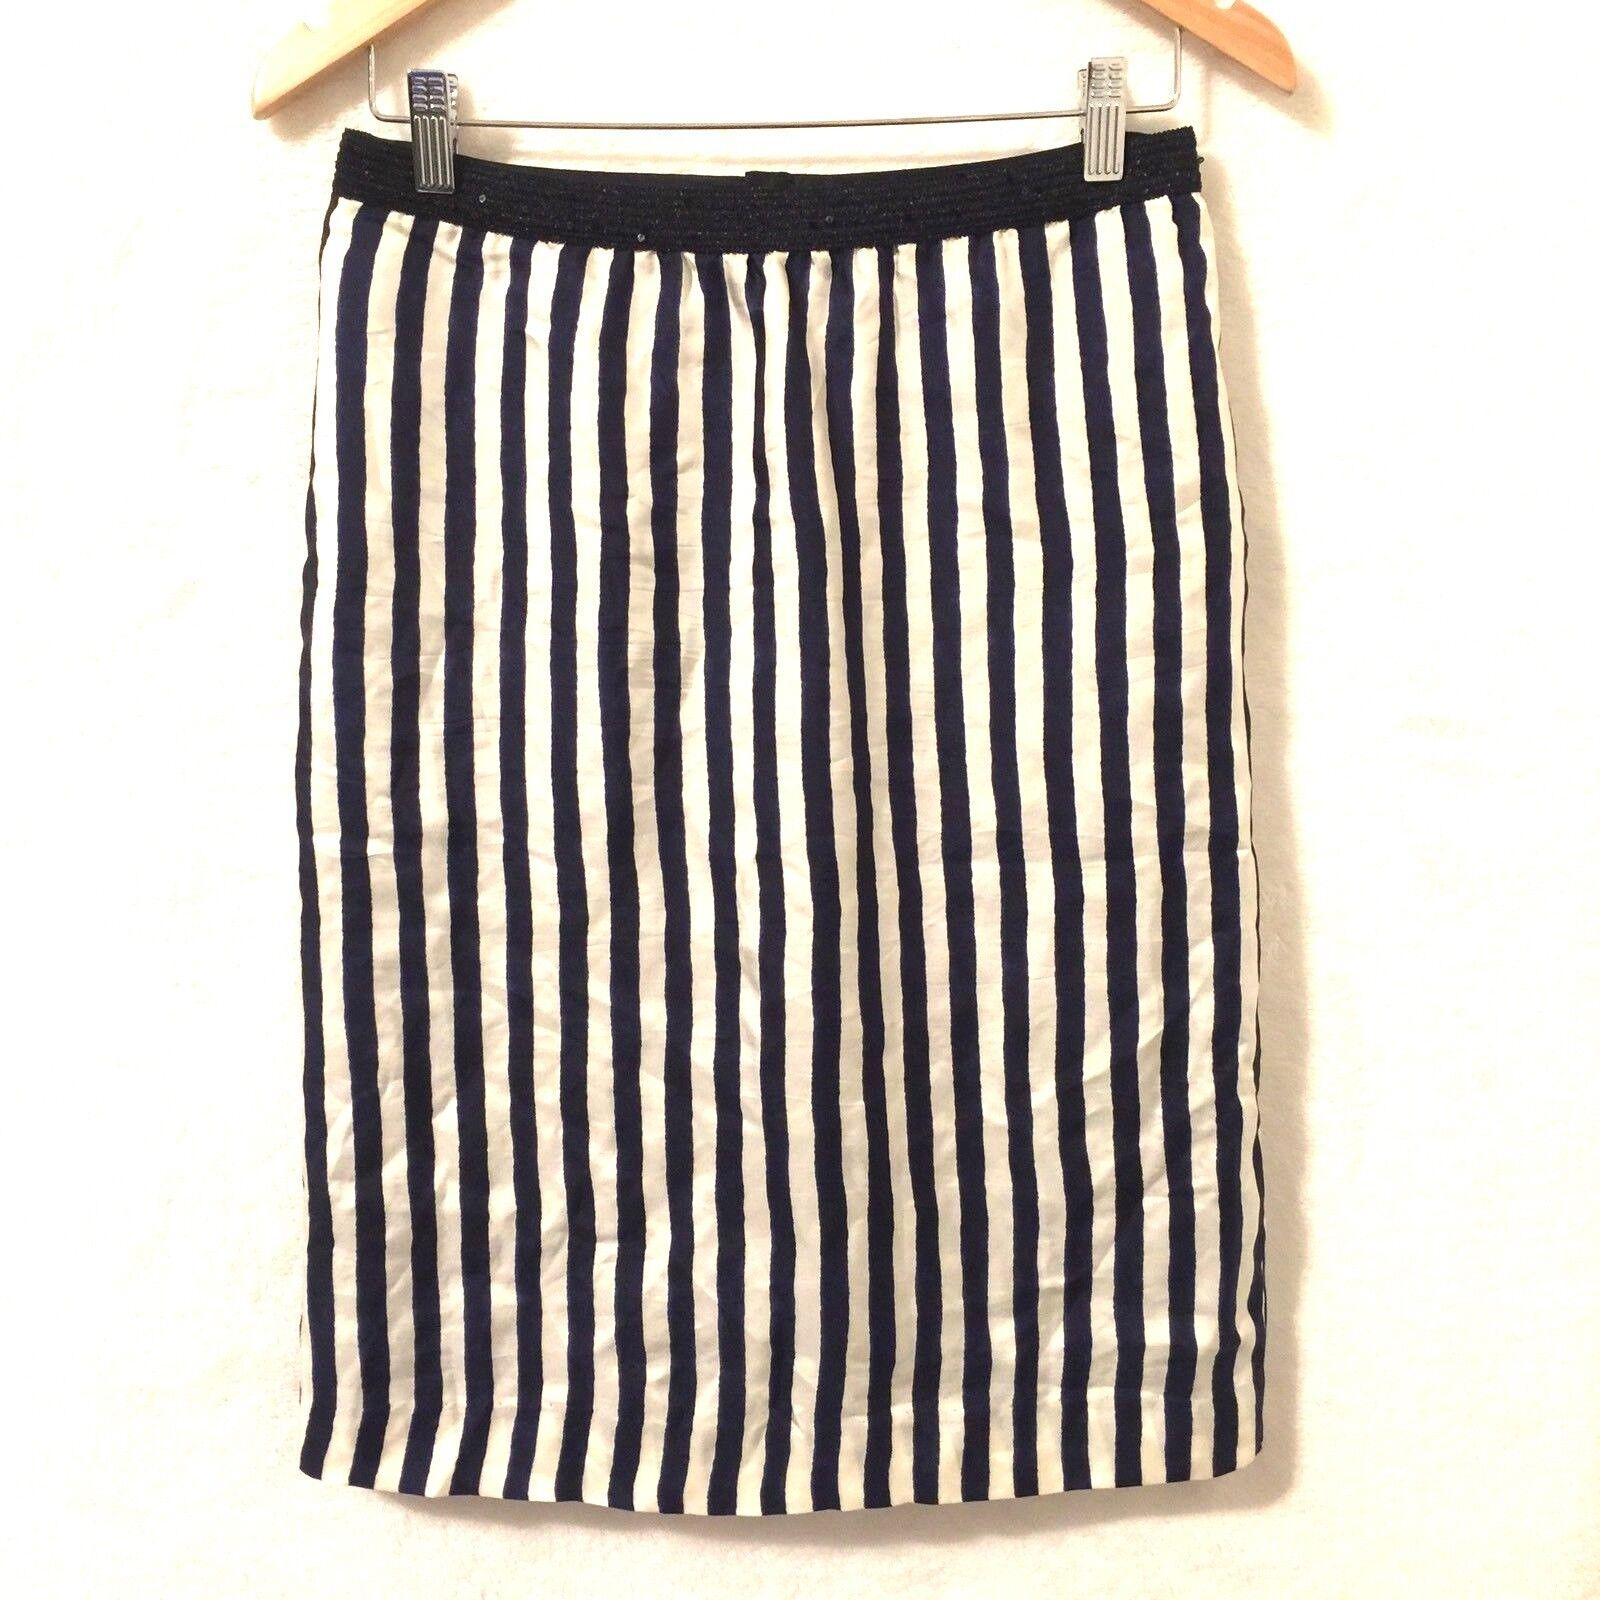 Pas De Calais Skirt Women's Size Small Silky Striped Over Knee Career Work Date